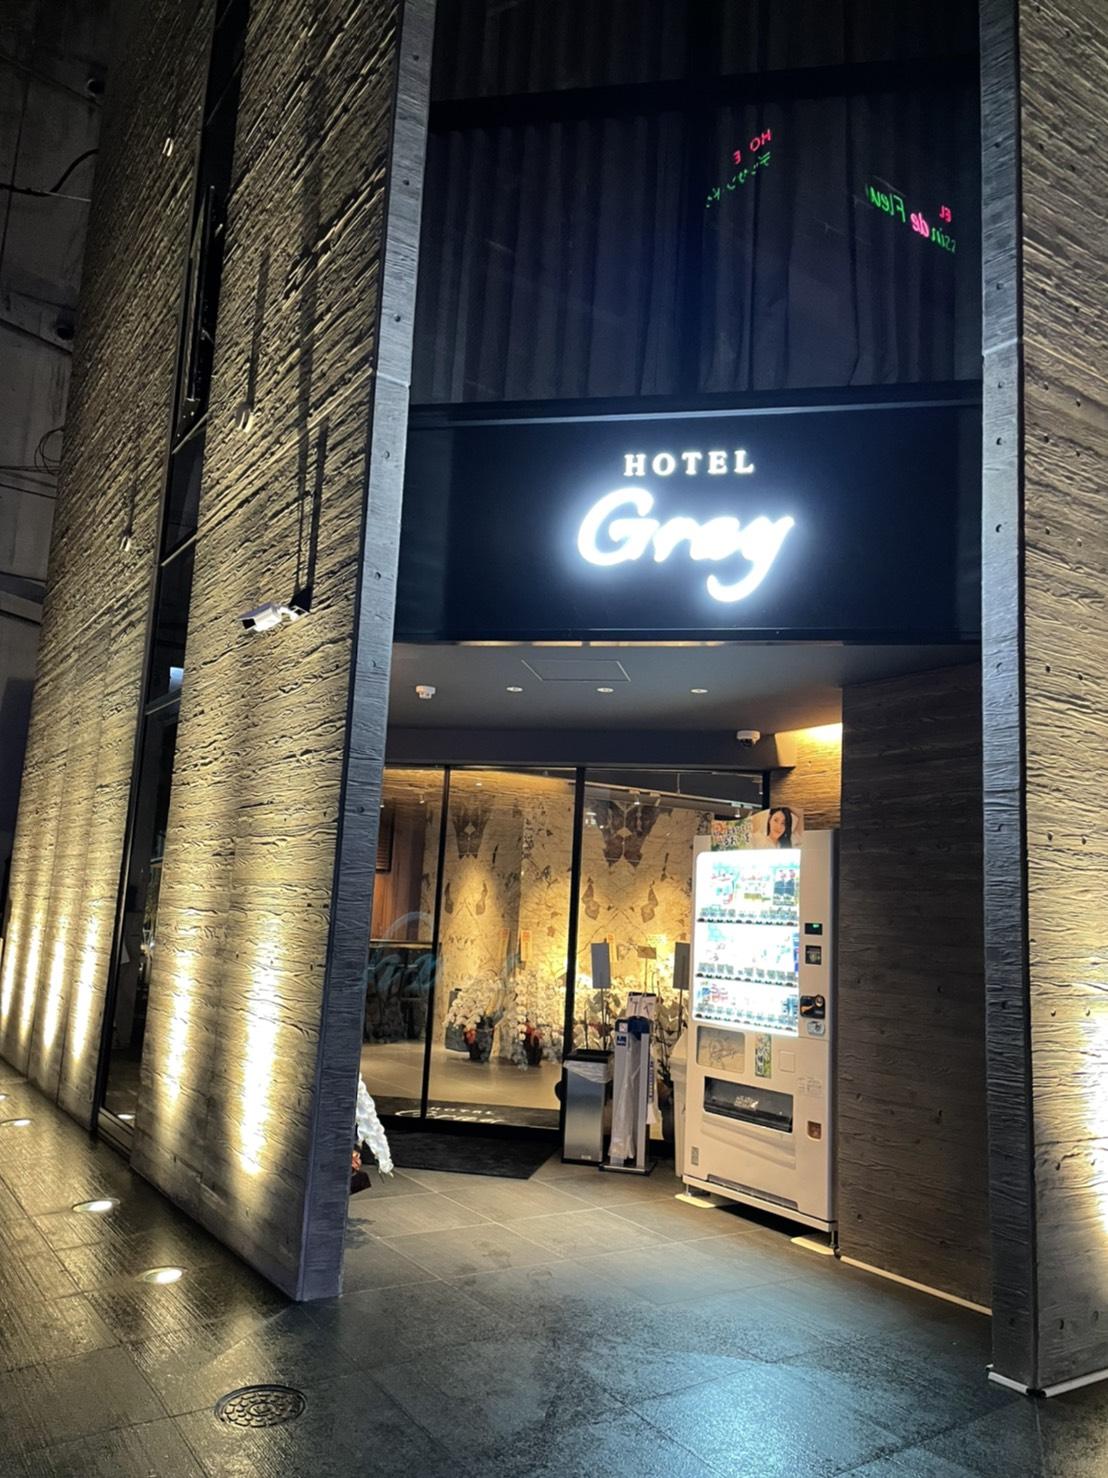 HOTEL GRAY